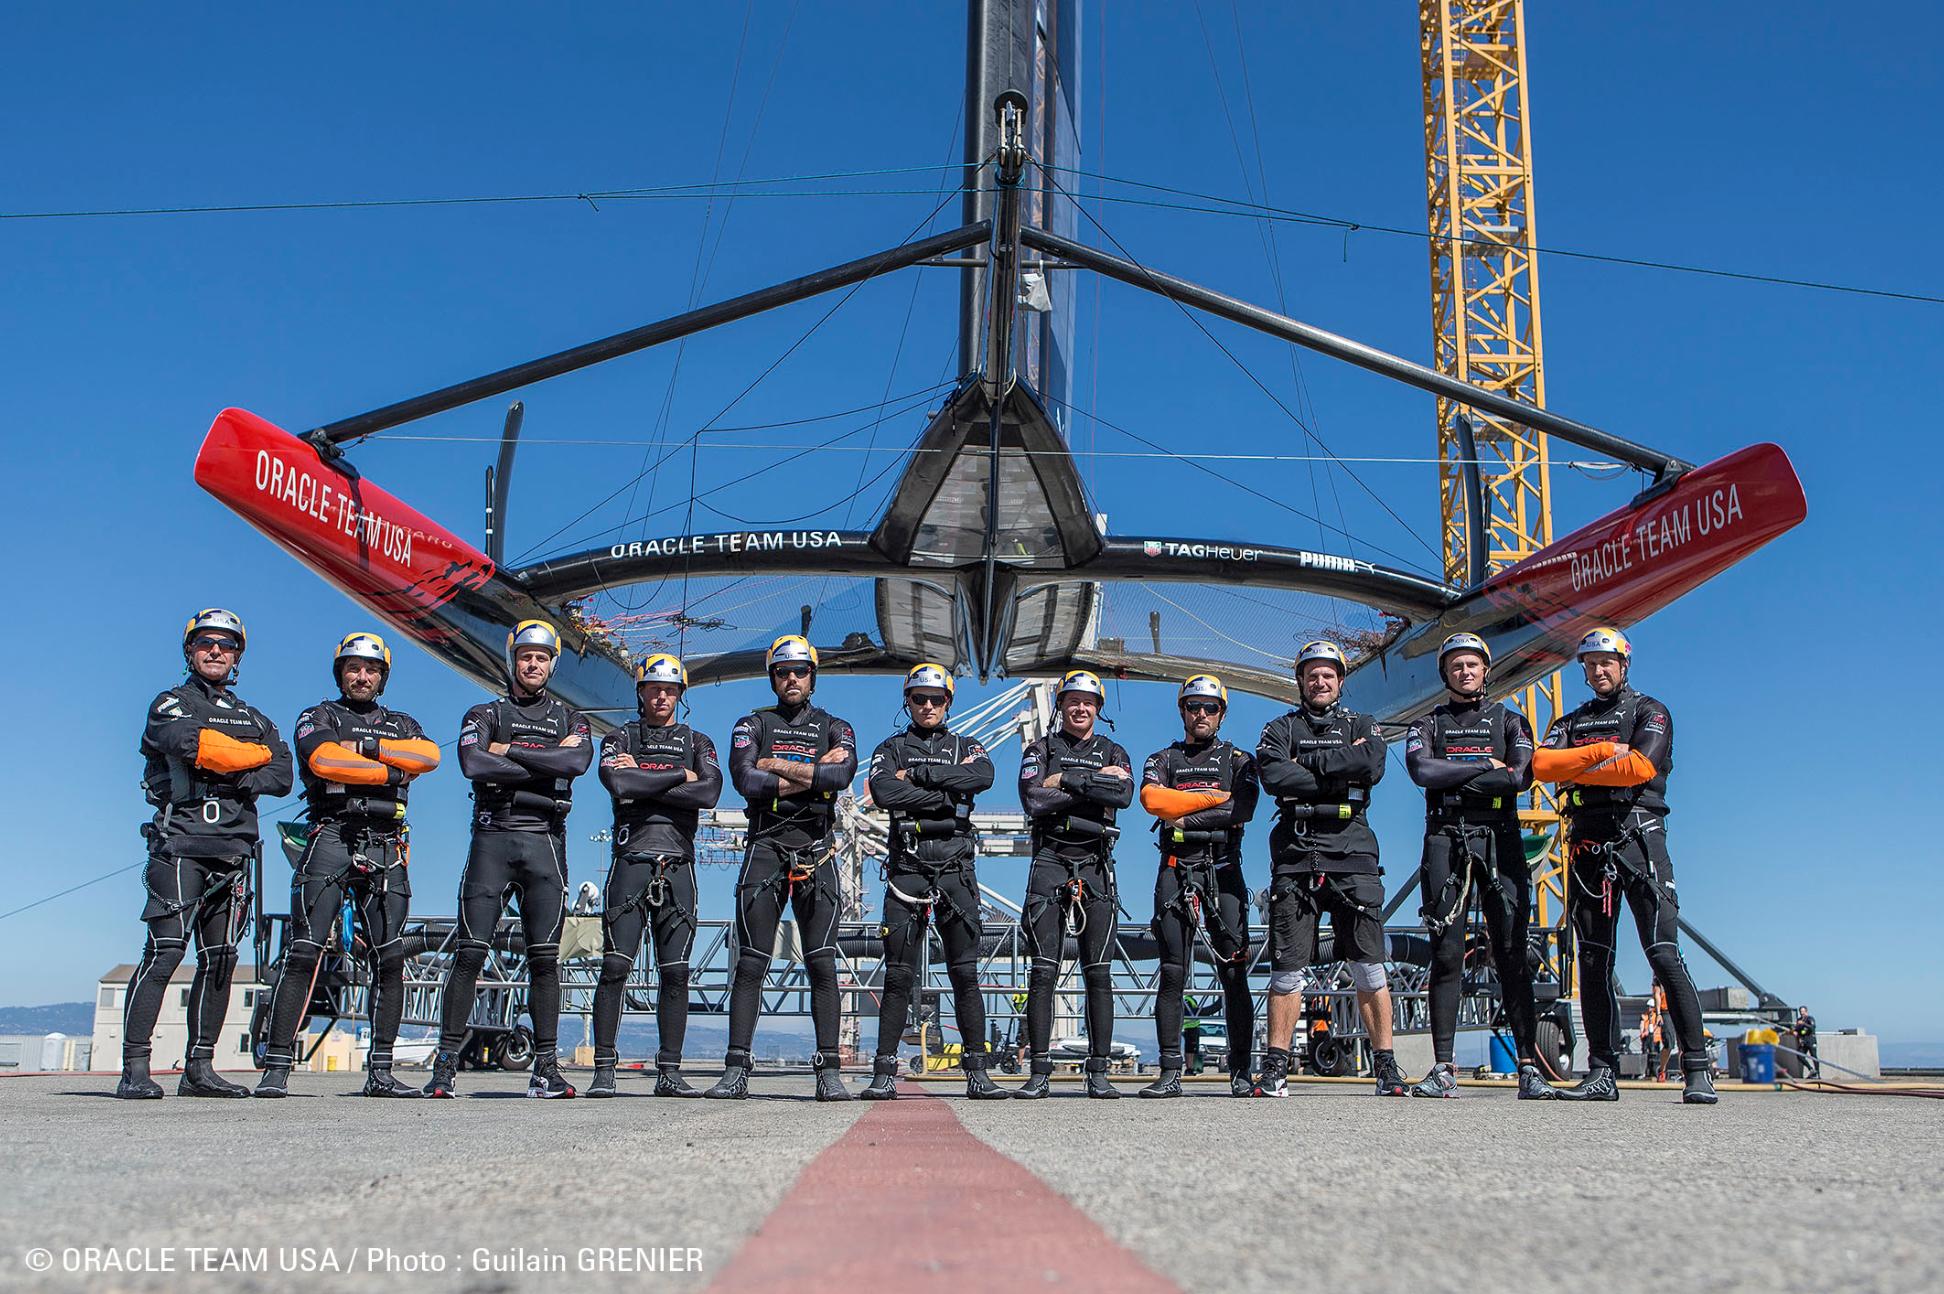 OTUSA Race Crew